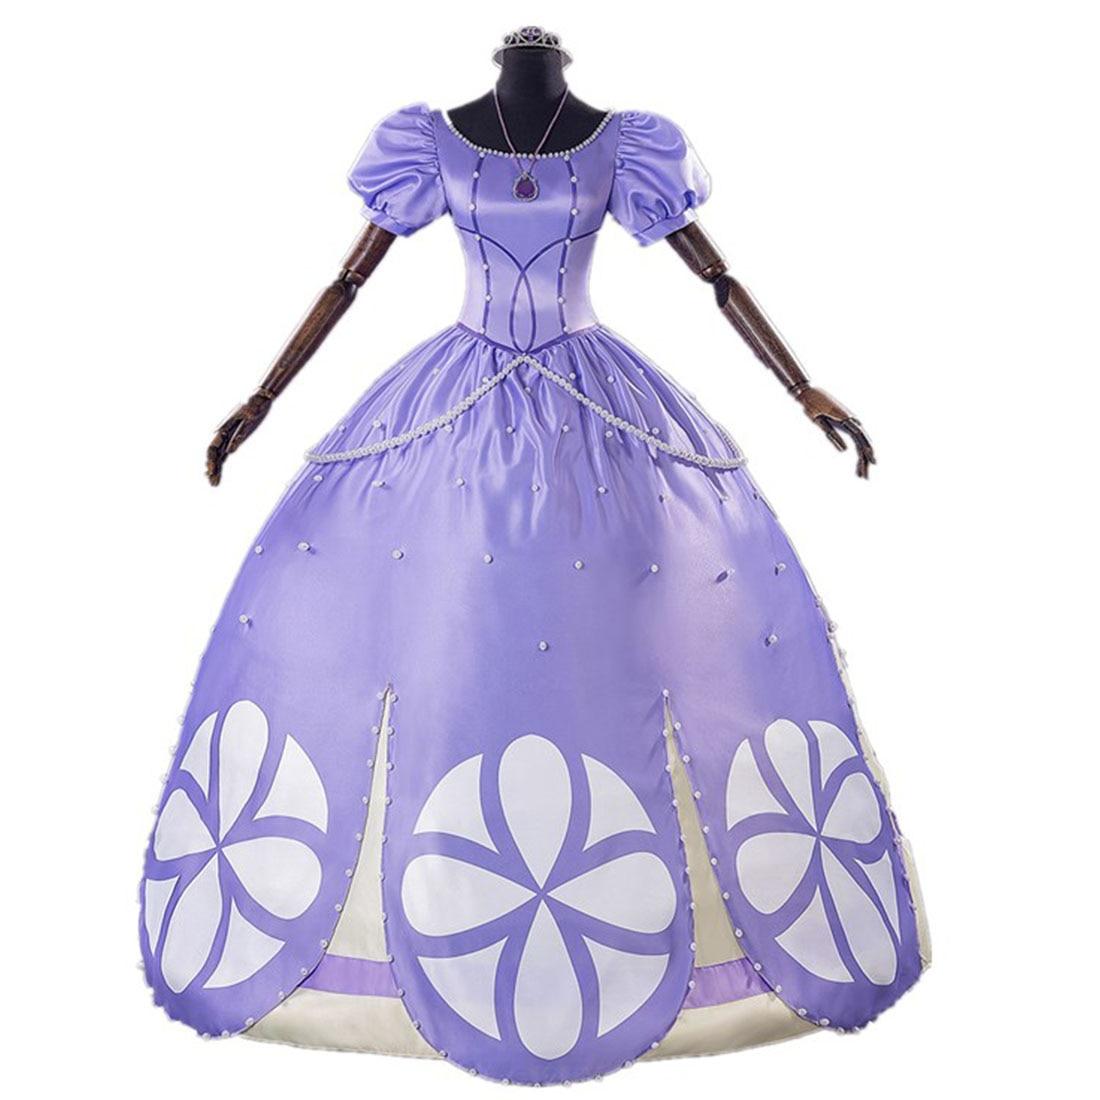 2019 Newest Fancy Halloween Costumes For Adult Women Sofia The First Princess Sofia Cosplay Costume Purple Sofia Dress Custom Ma